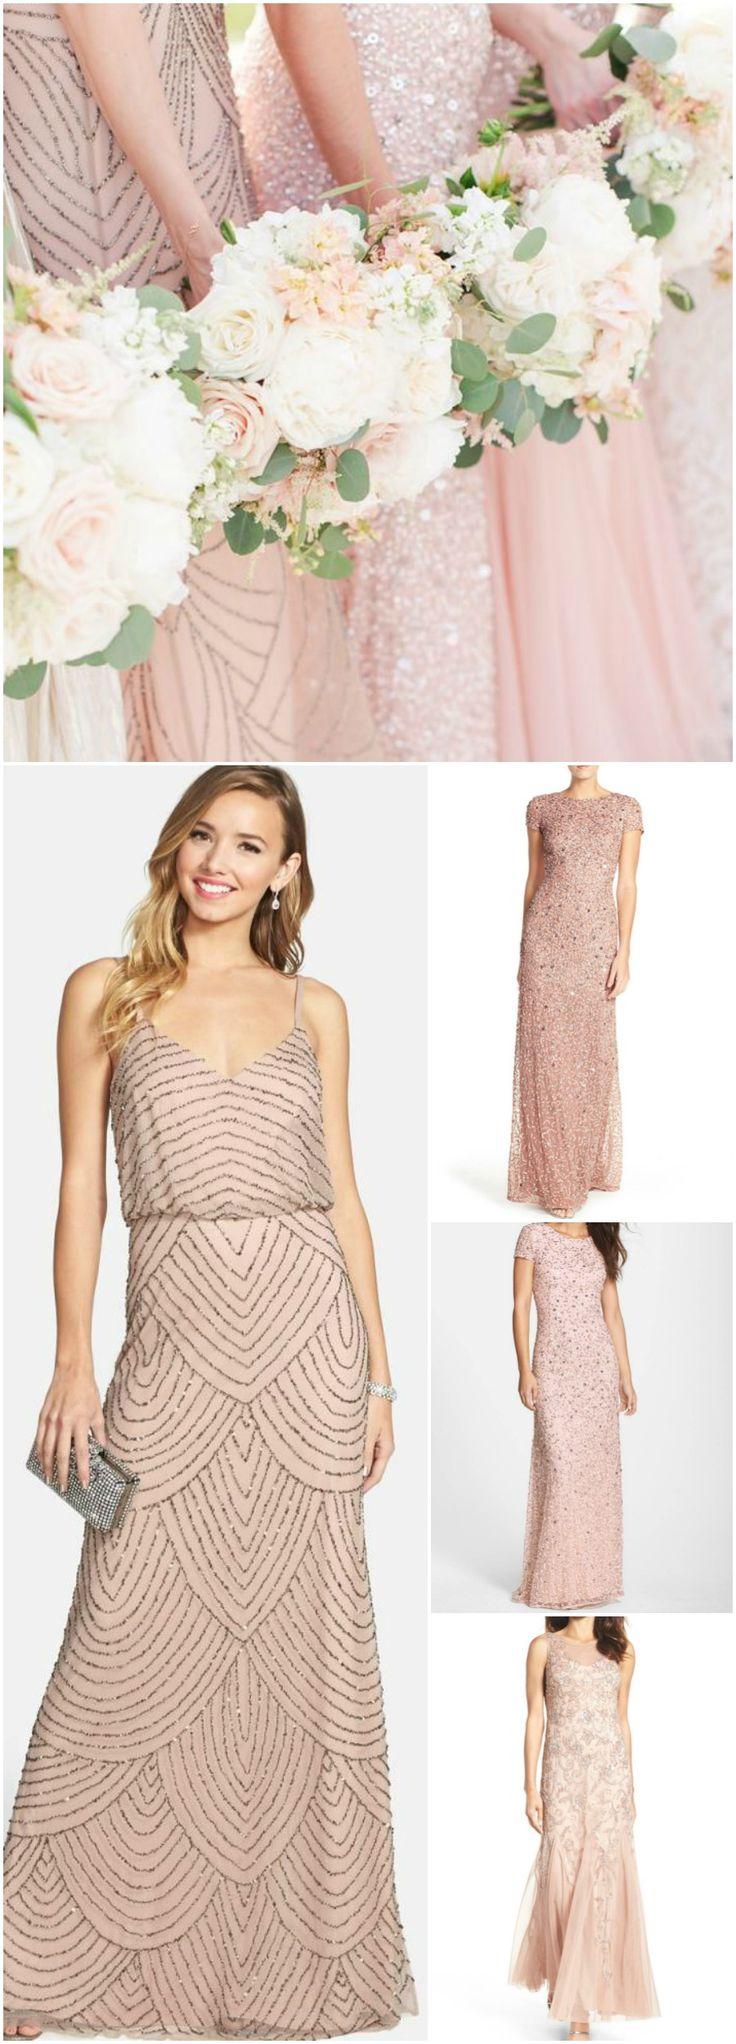 Best 25 blush bridesmaid dresses ideas on pinterest blush blush wedding styling nordstrom anniversary sale ombrellifo Choice Image